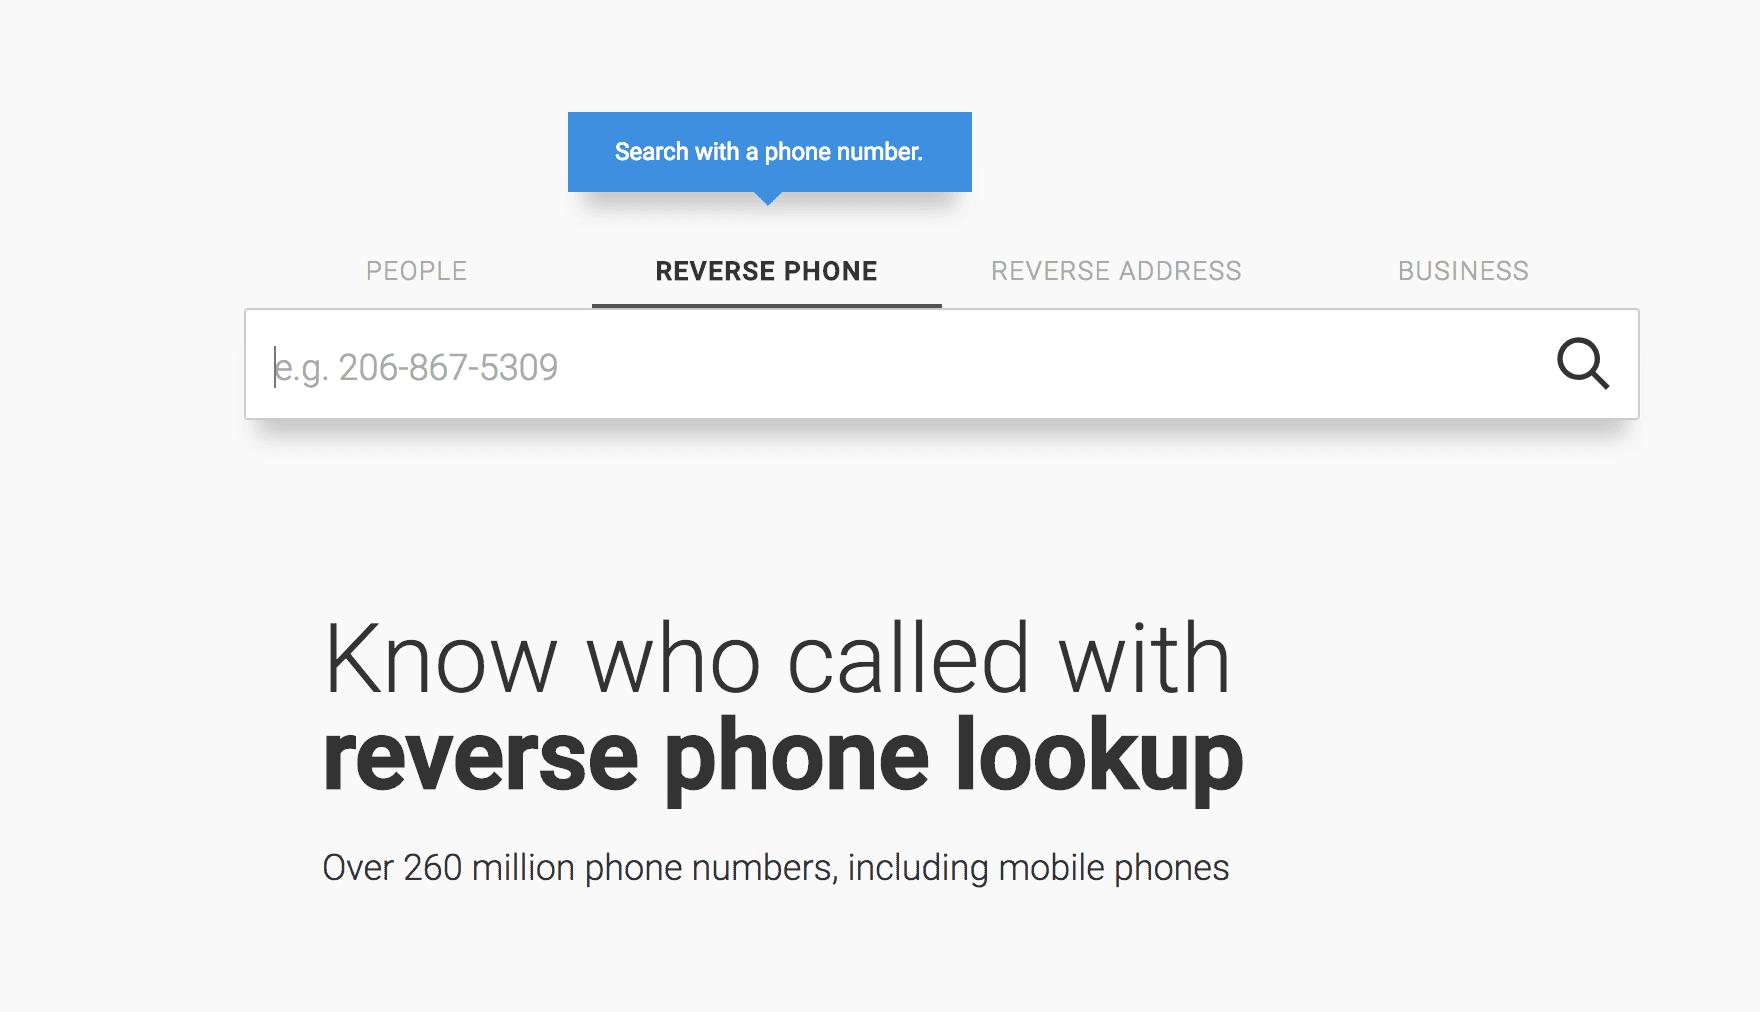 screenshot of reverse phone lookup screen